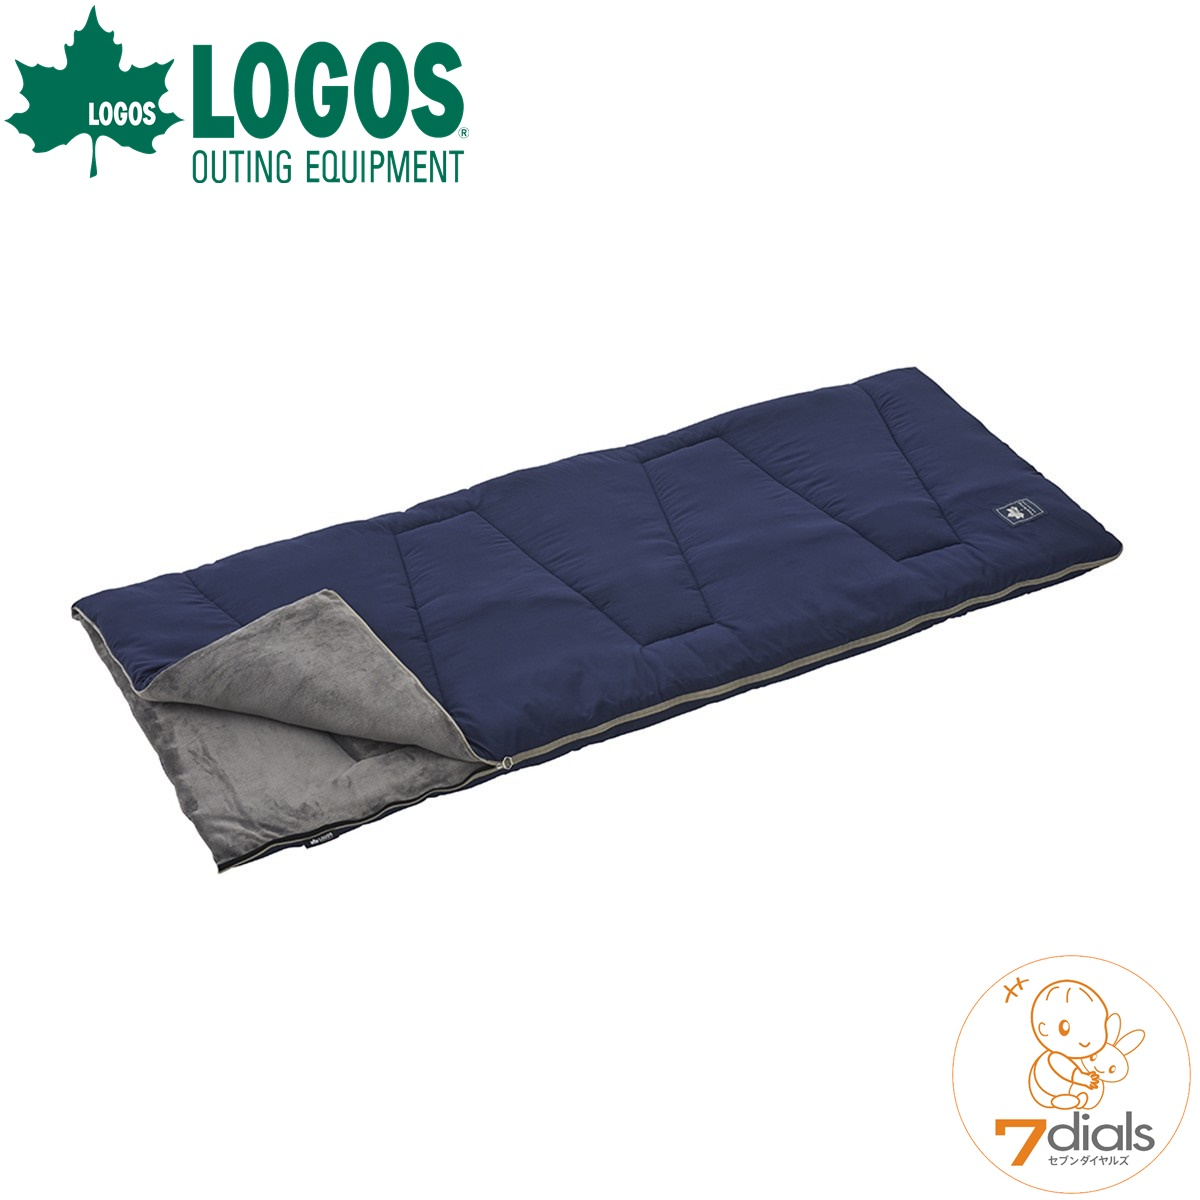 LOGOS/ロゴス 丸洗いソフトタッチシュラフ・0 表はサラサラ、中はやわらか 丸洗い可能な寝袋【送料無料】